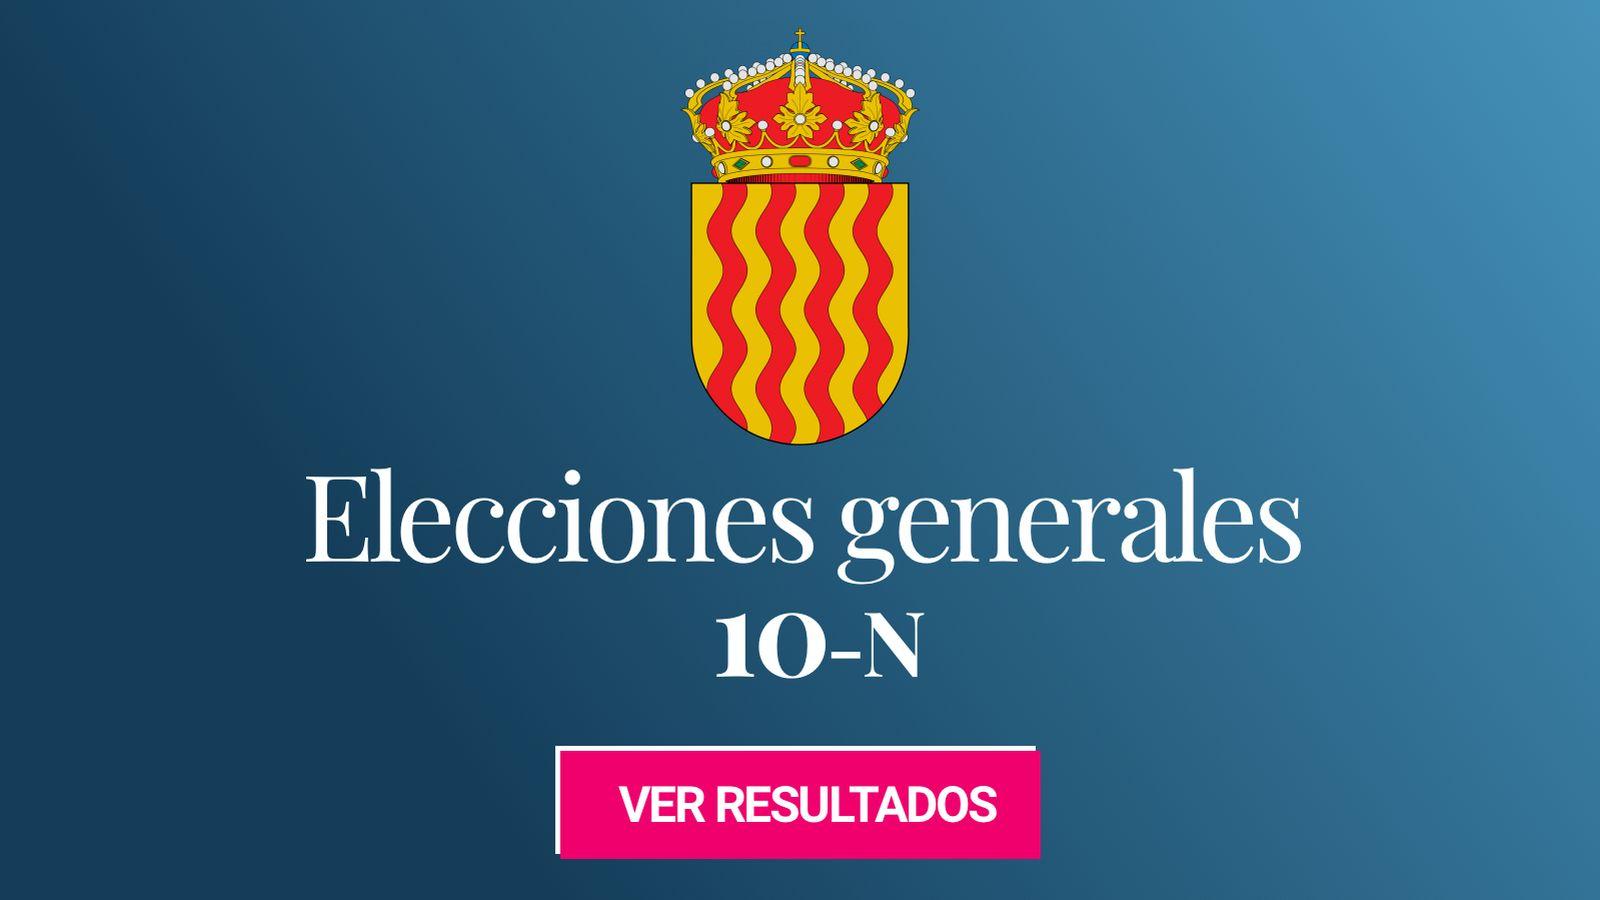 Foto: Elecciones generales 2019 en Tarragona. (C.C./EC)